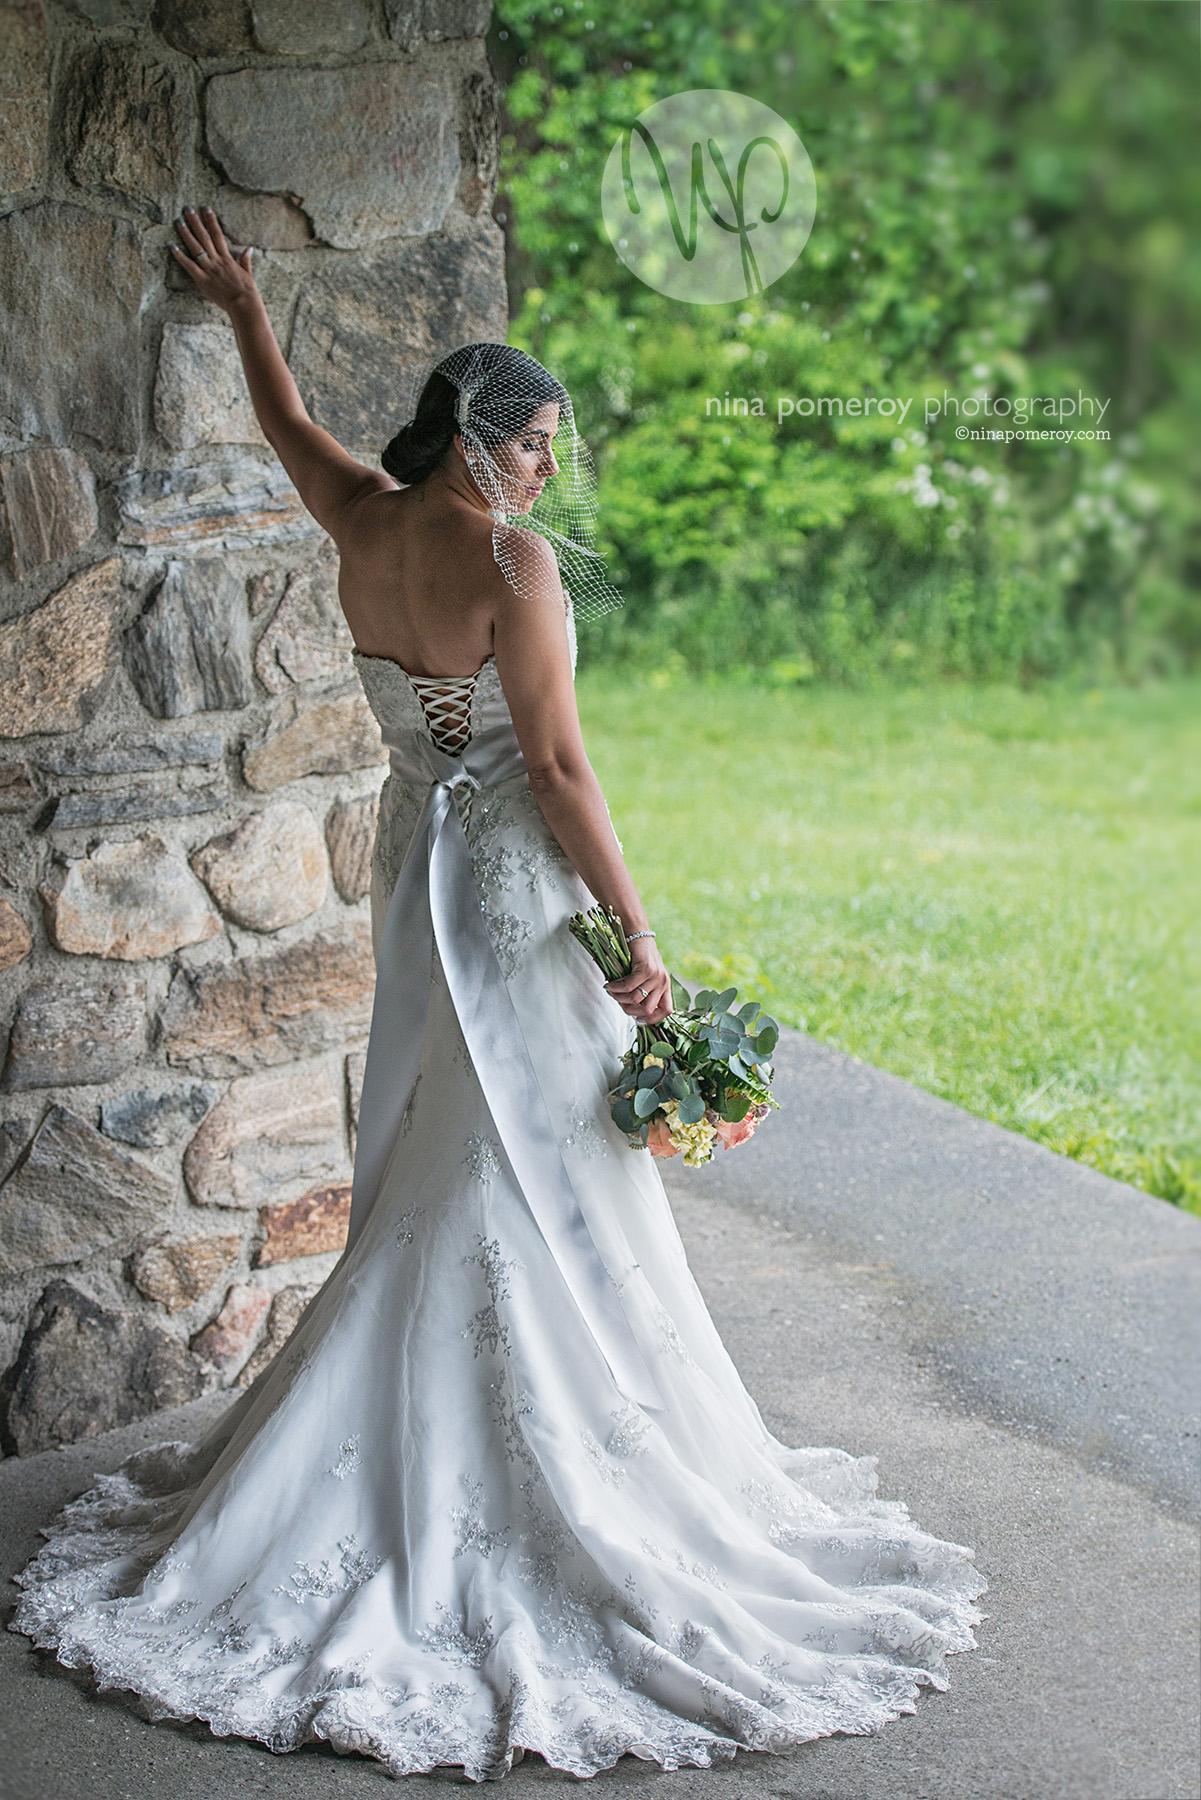 san ramon garden wedding photographer ninapomeroy.com